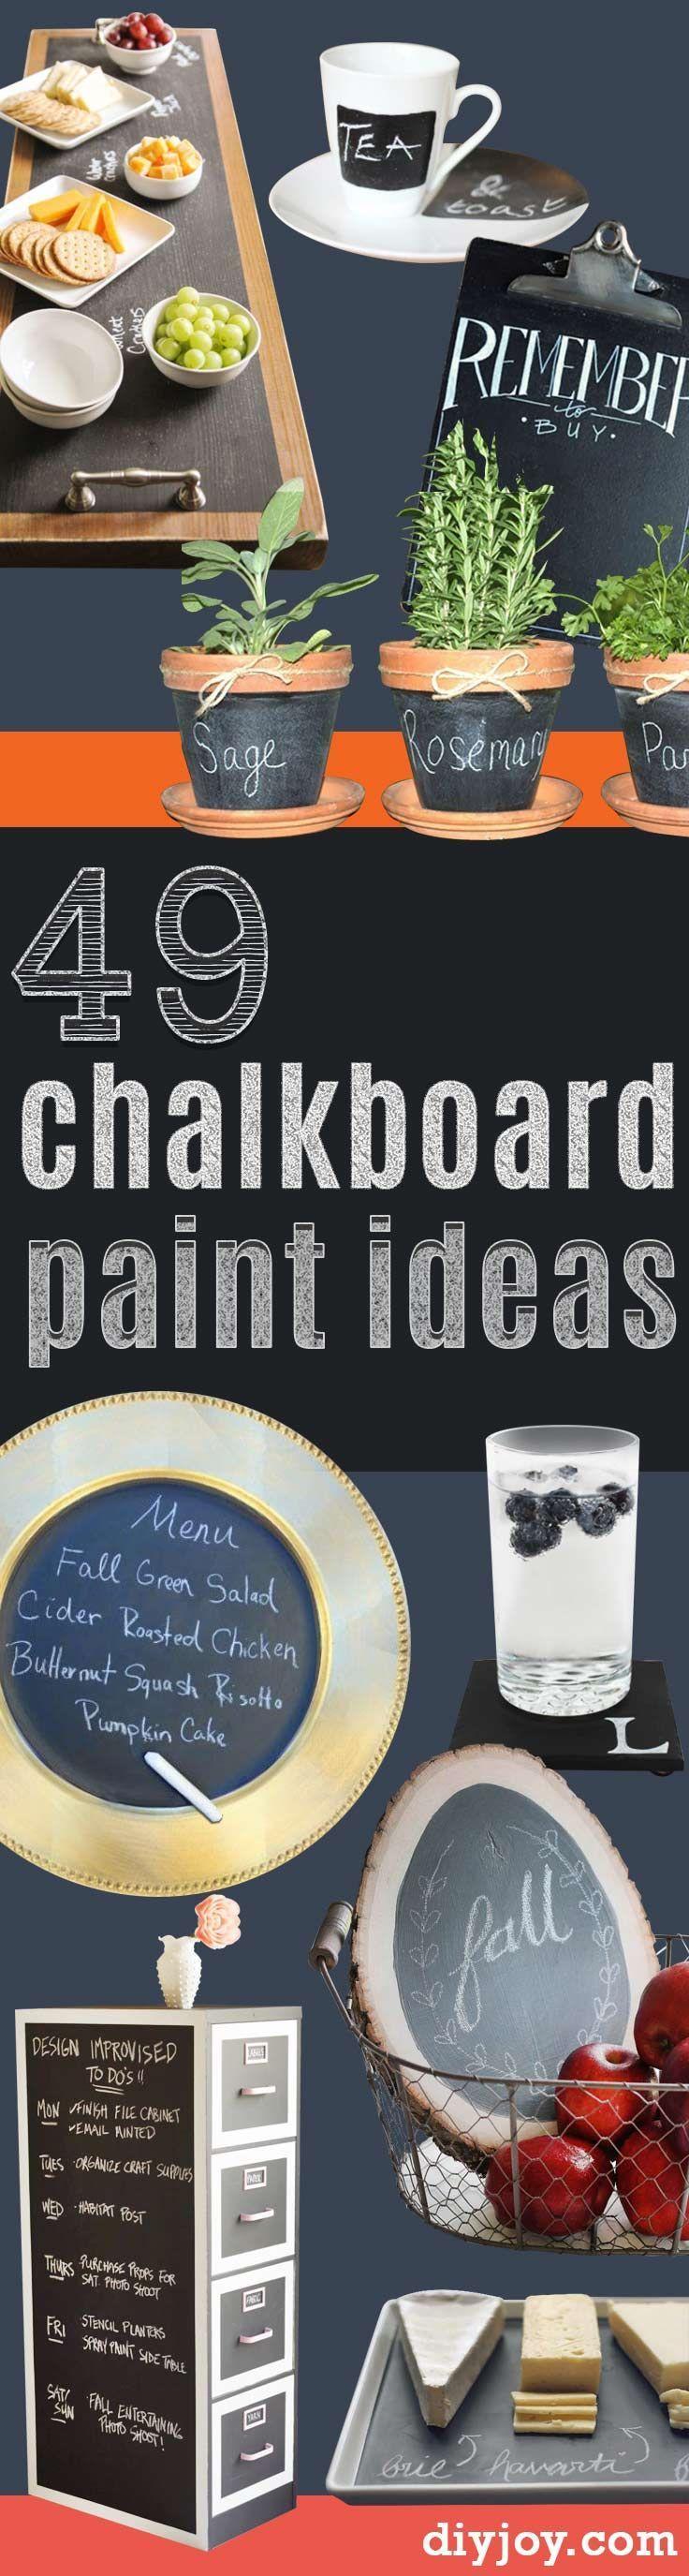 226 Best Images About Crafts Diy On Pinterest